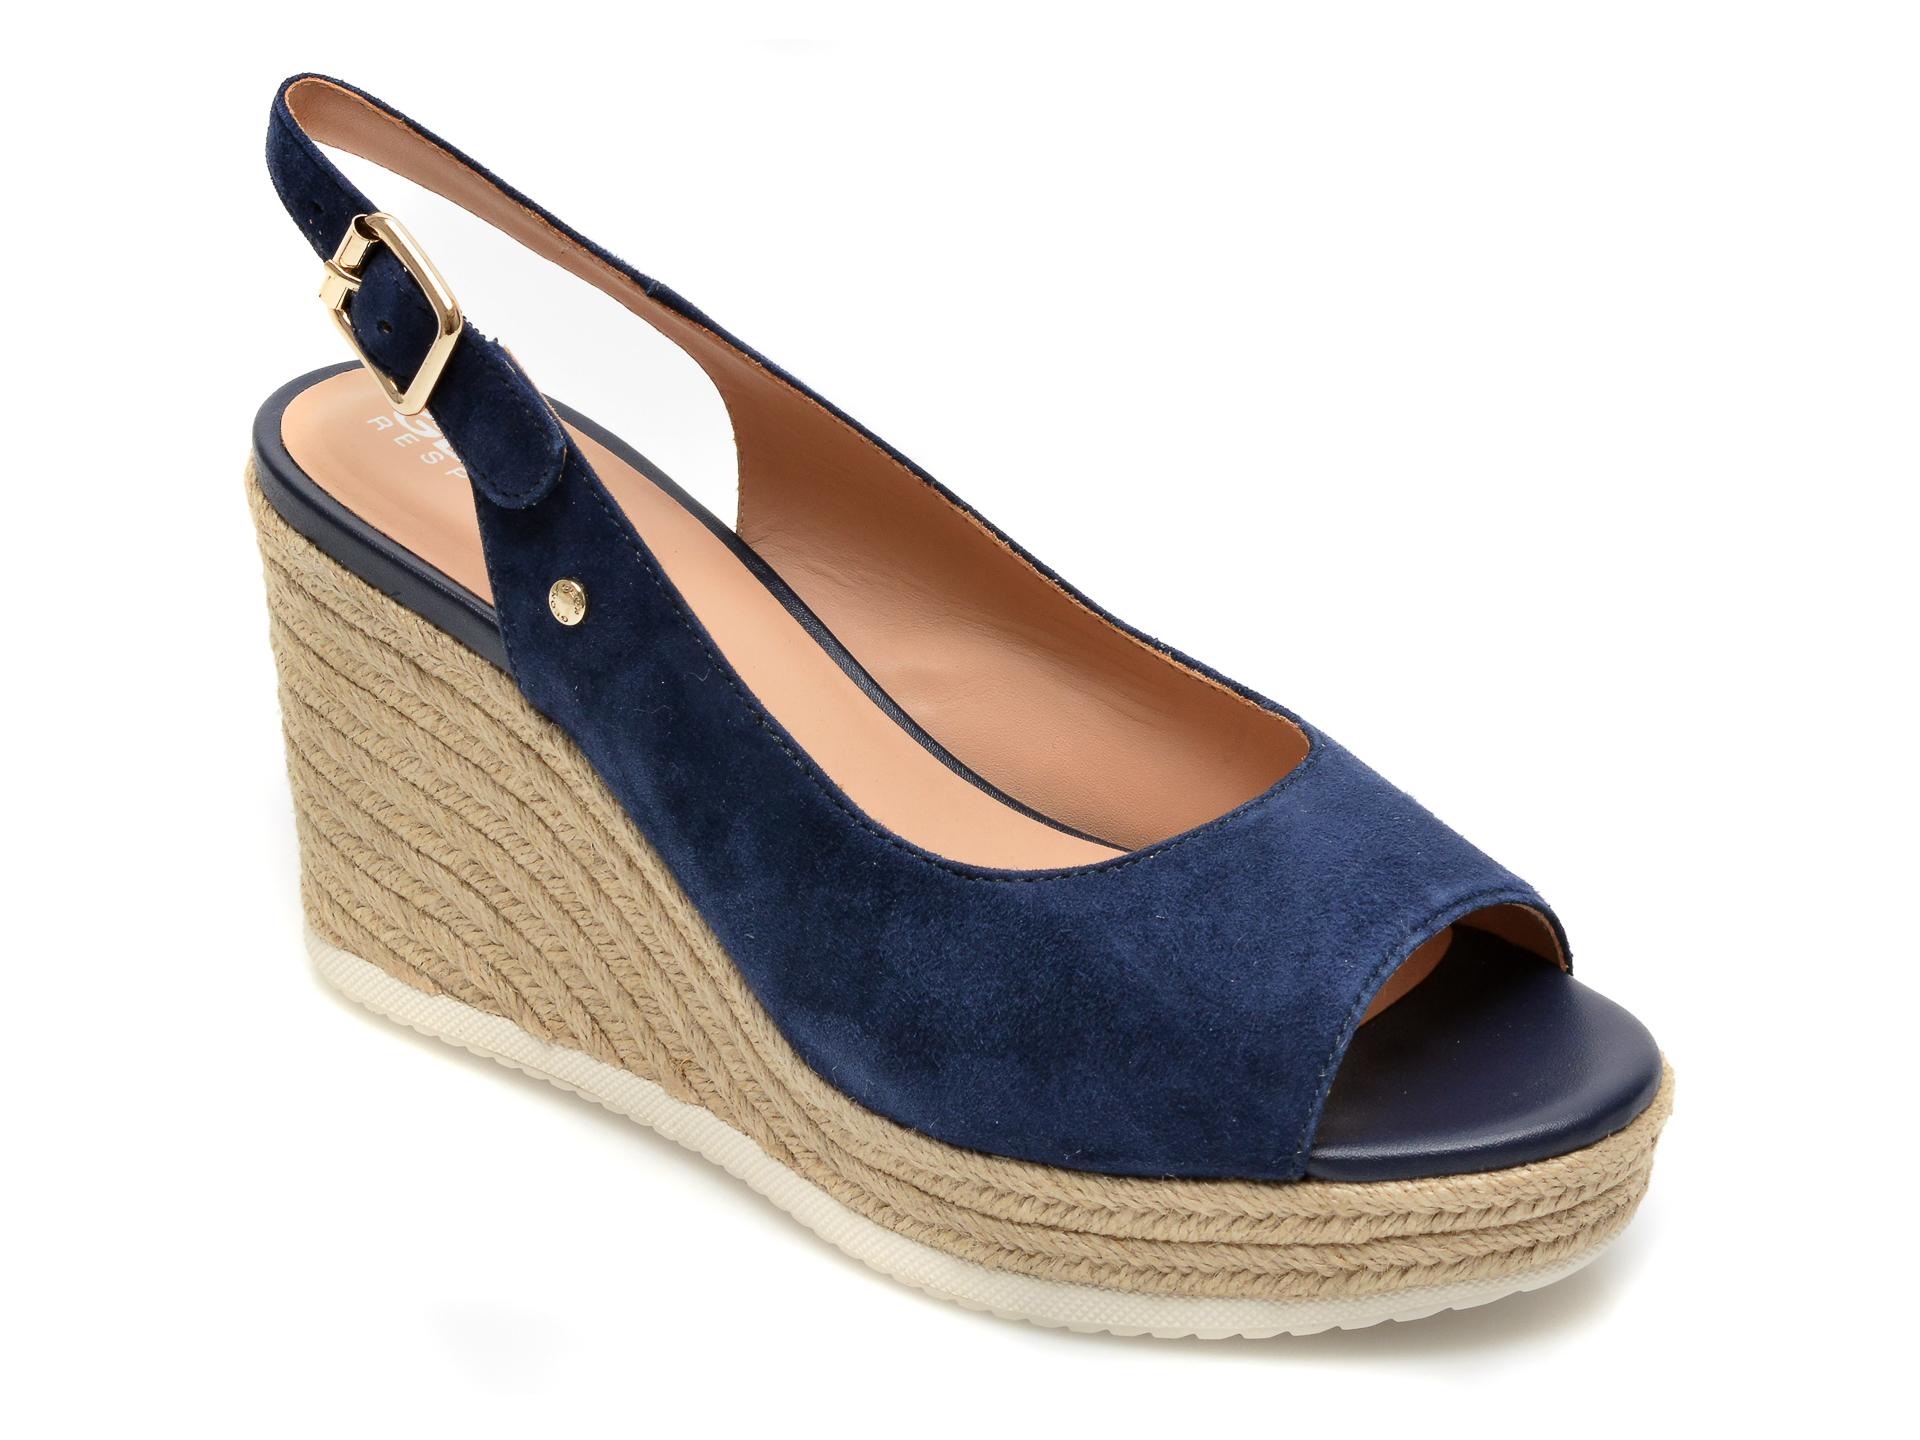 Sandale GEOX albastre, D02GVD, din piele intoarsa